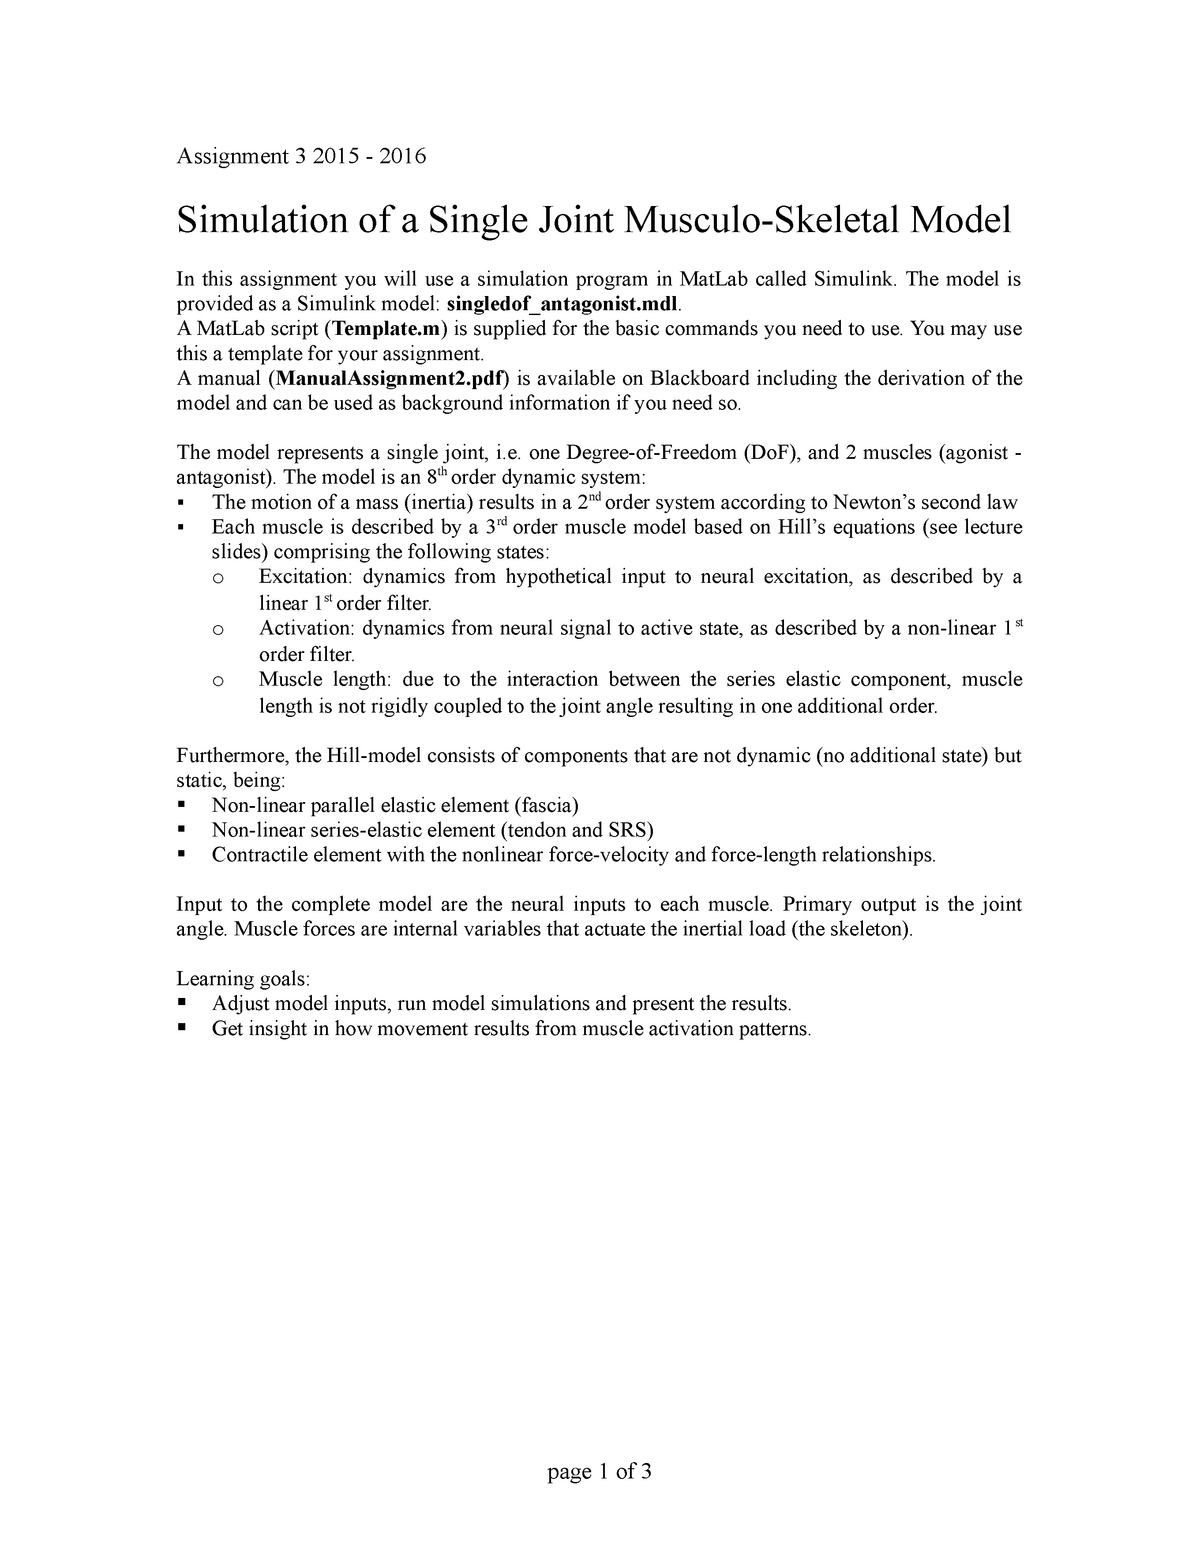 Practical - Assignment 3 Elbow Model - BM3102A